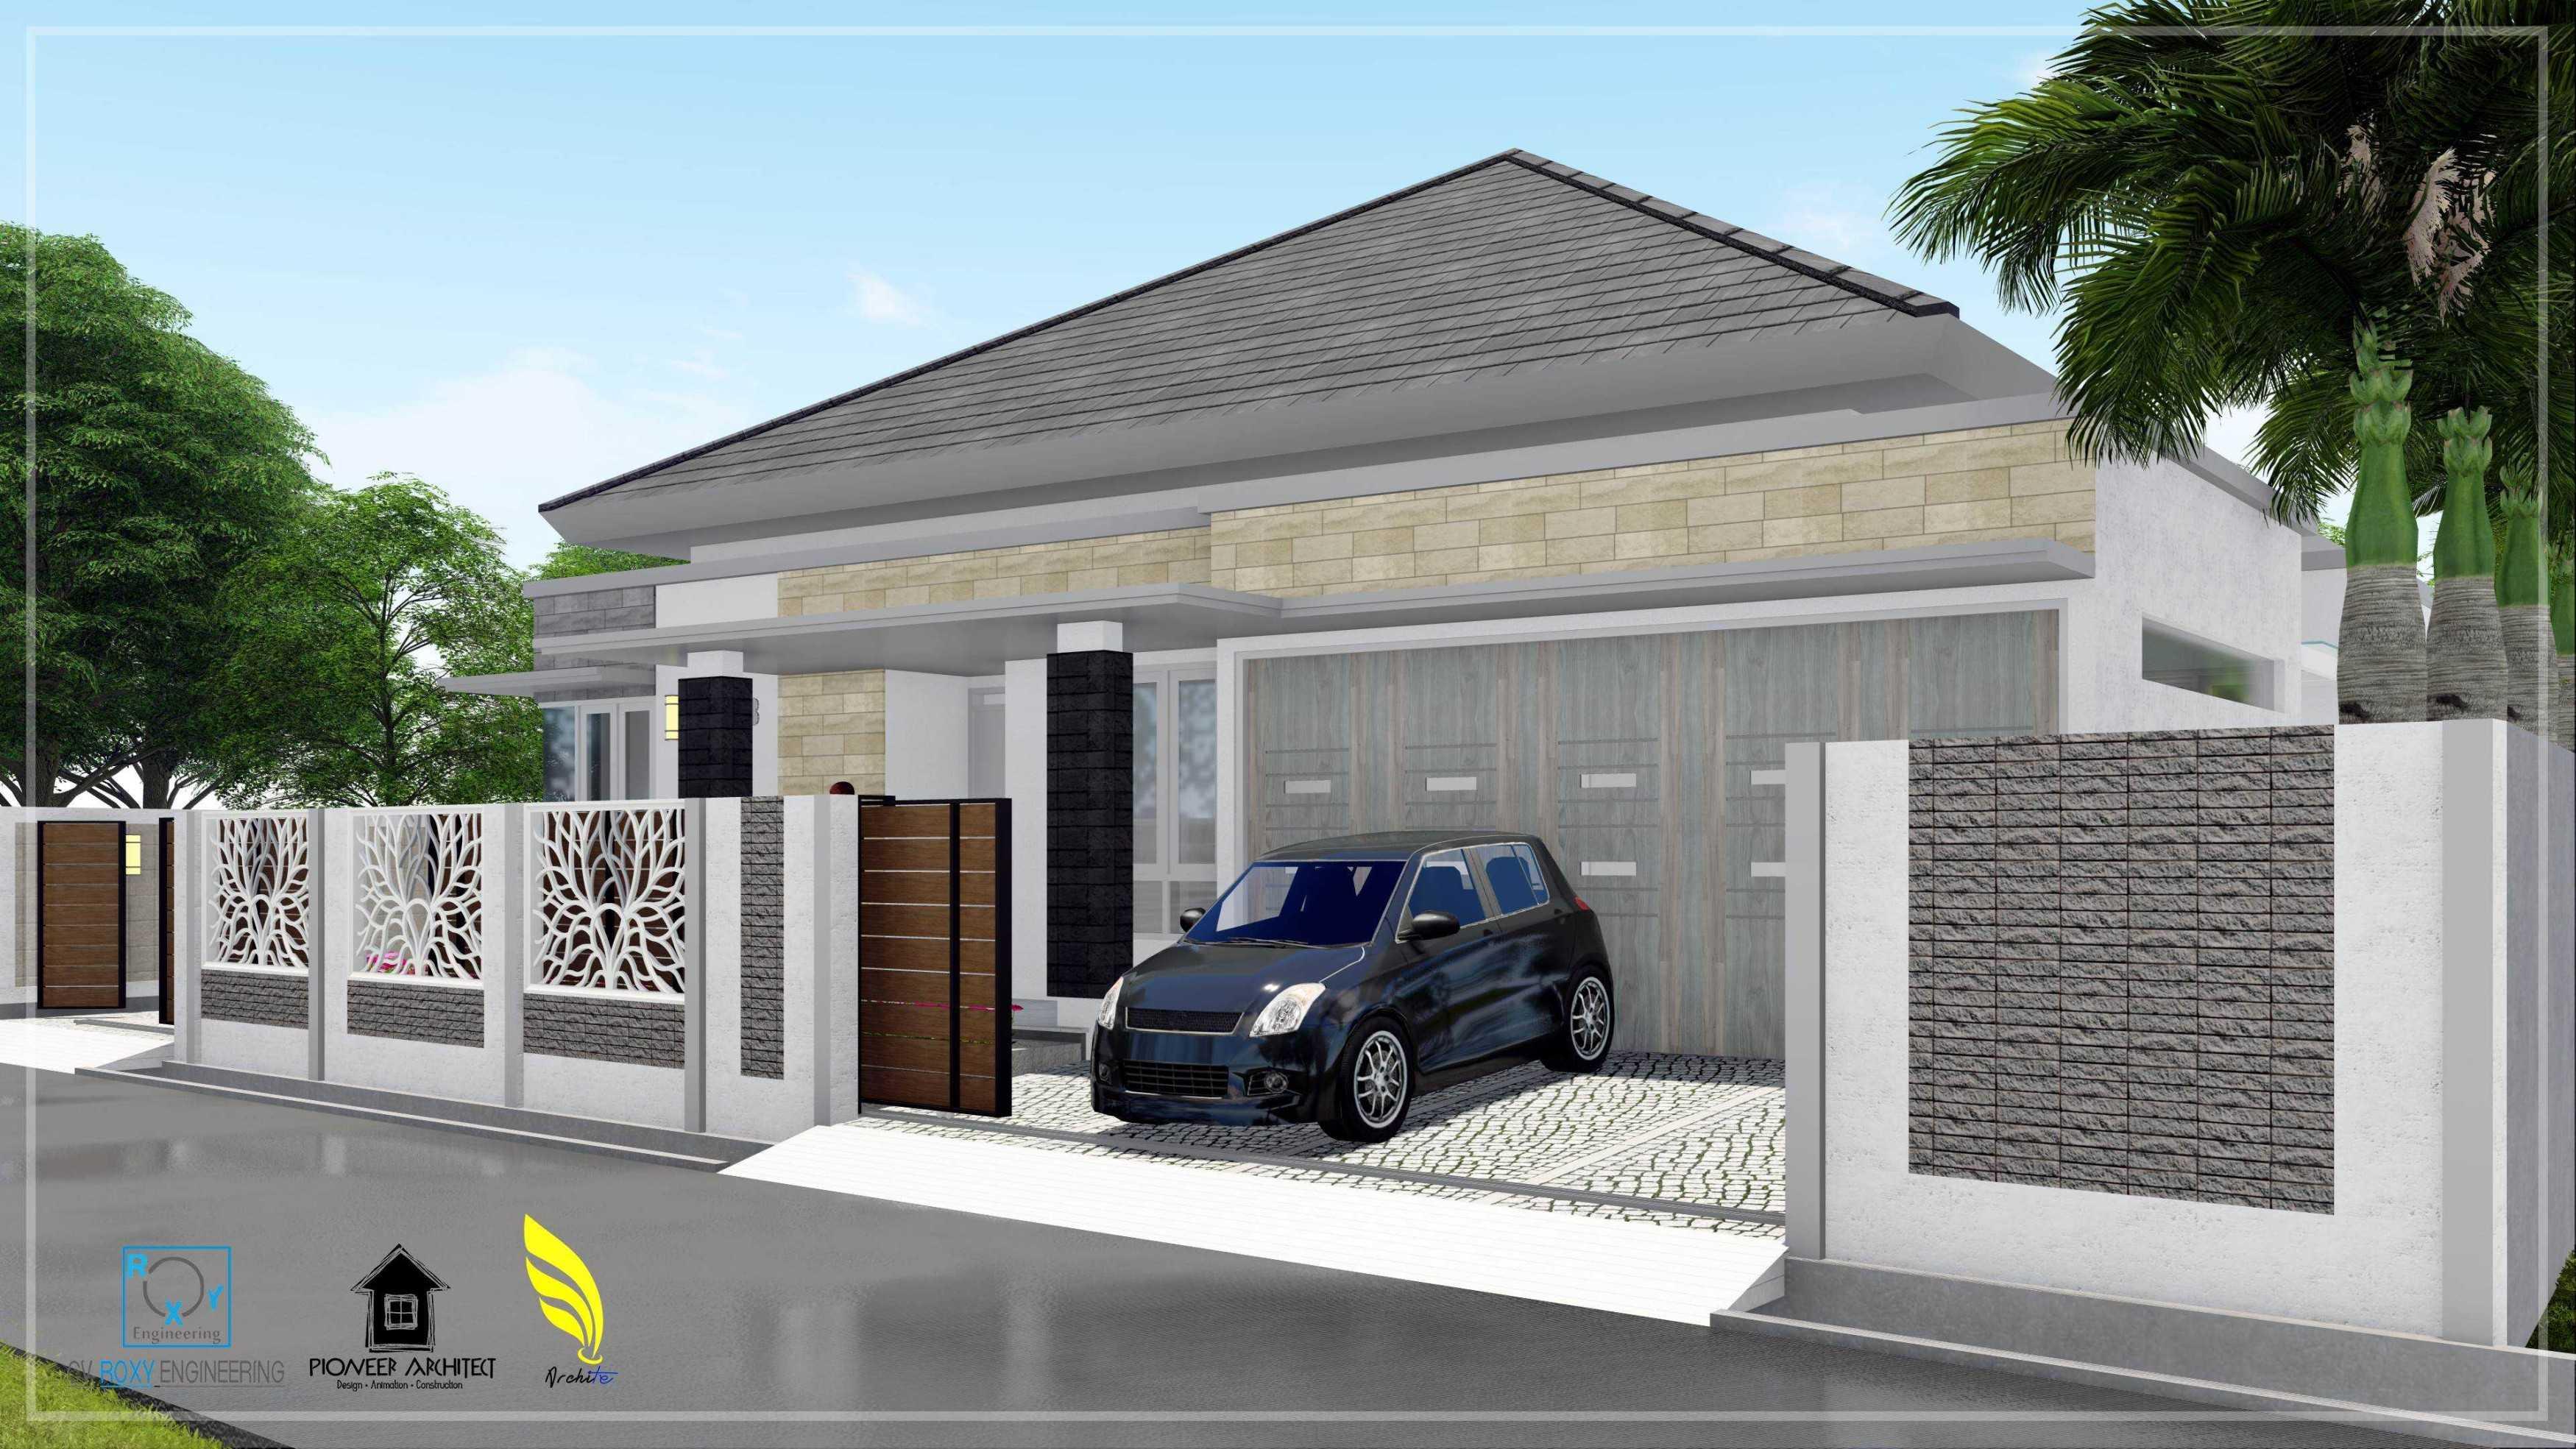 Pionner Architect Dd House Banda Aceh, Kota Banda Aceh, Aceh, Indonesia Banda Aceh, Kota Banda Aceh, Aceh, Indonesia Tampak Depan Modern  43289